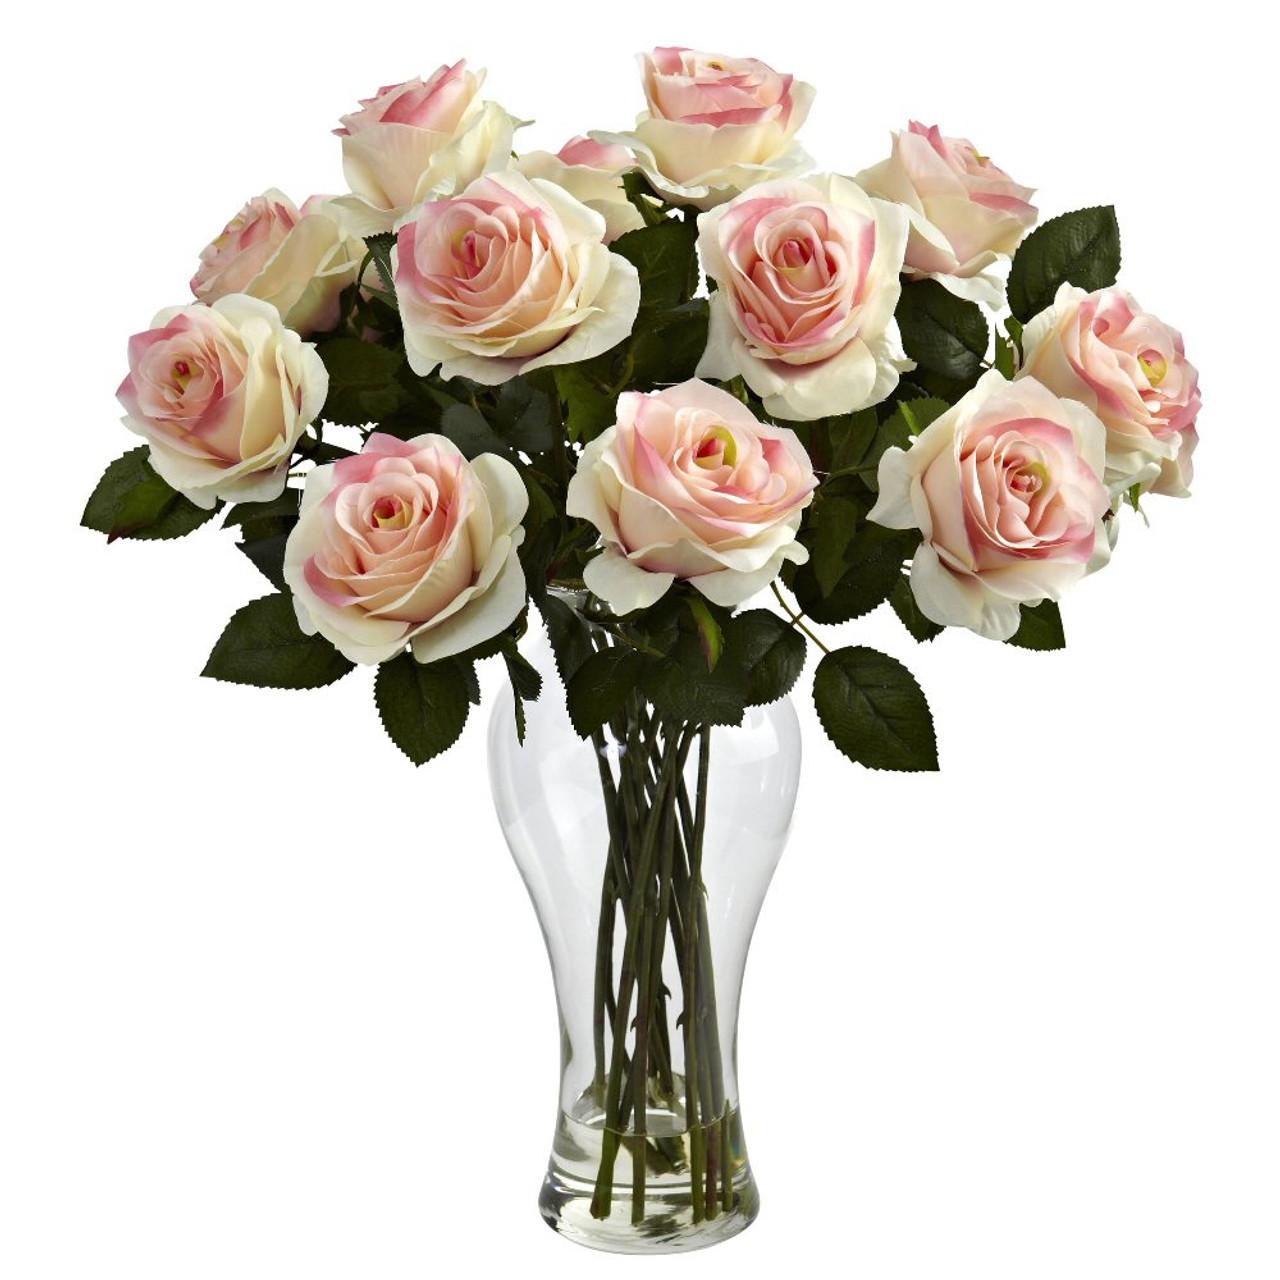 Blooming Light Pink Roses Silk Flower Arrangement with Vase - Artificial Flowers - Silk Flowers  sc 1 st  JataShop & Blooming Light Pink Roses Silk Flower Arrangement with Vase ...